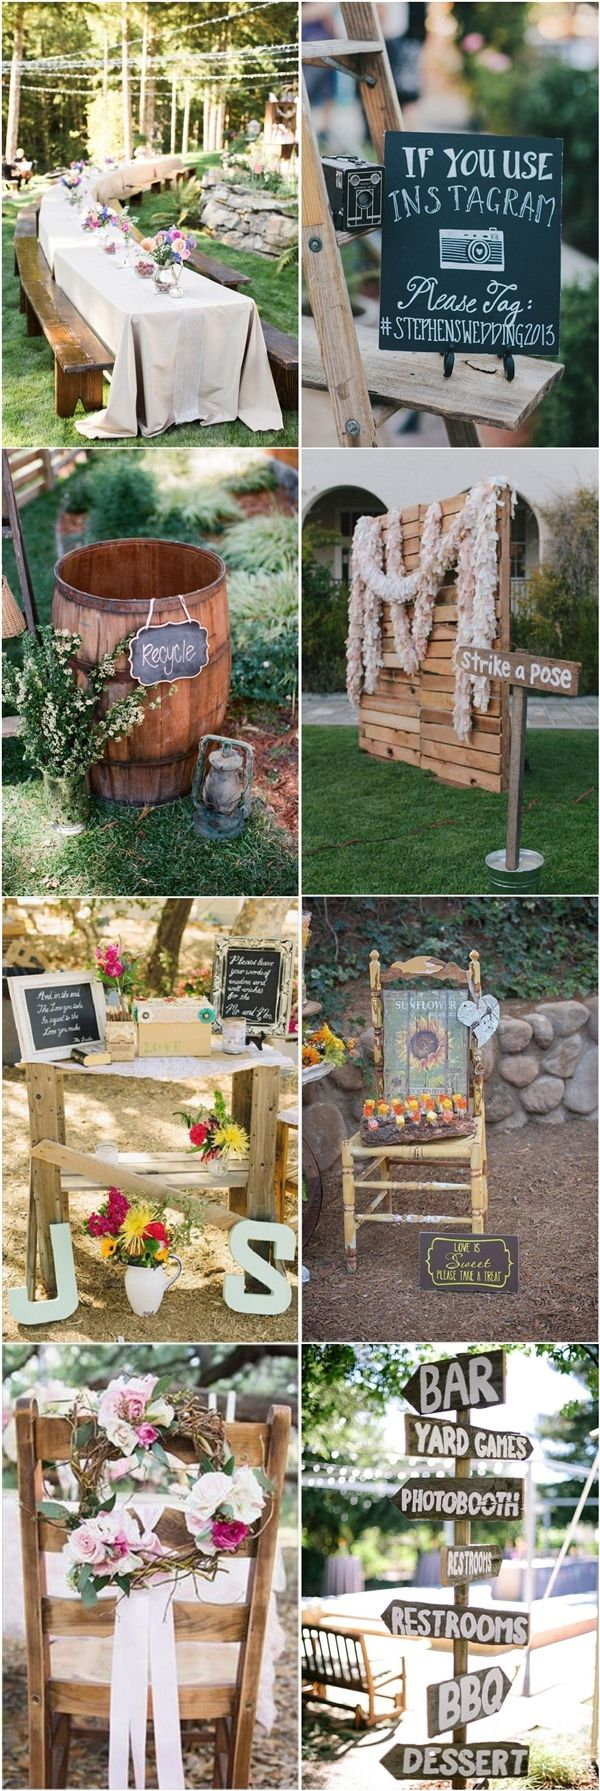 colorful rustic barn wedding amanda kevin 100 layer cake